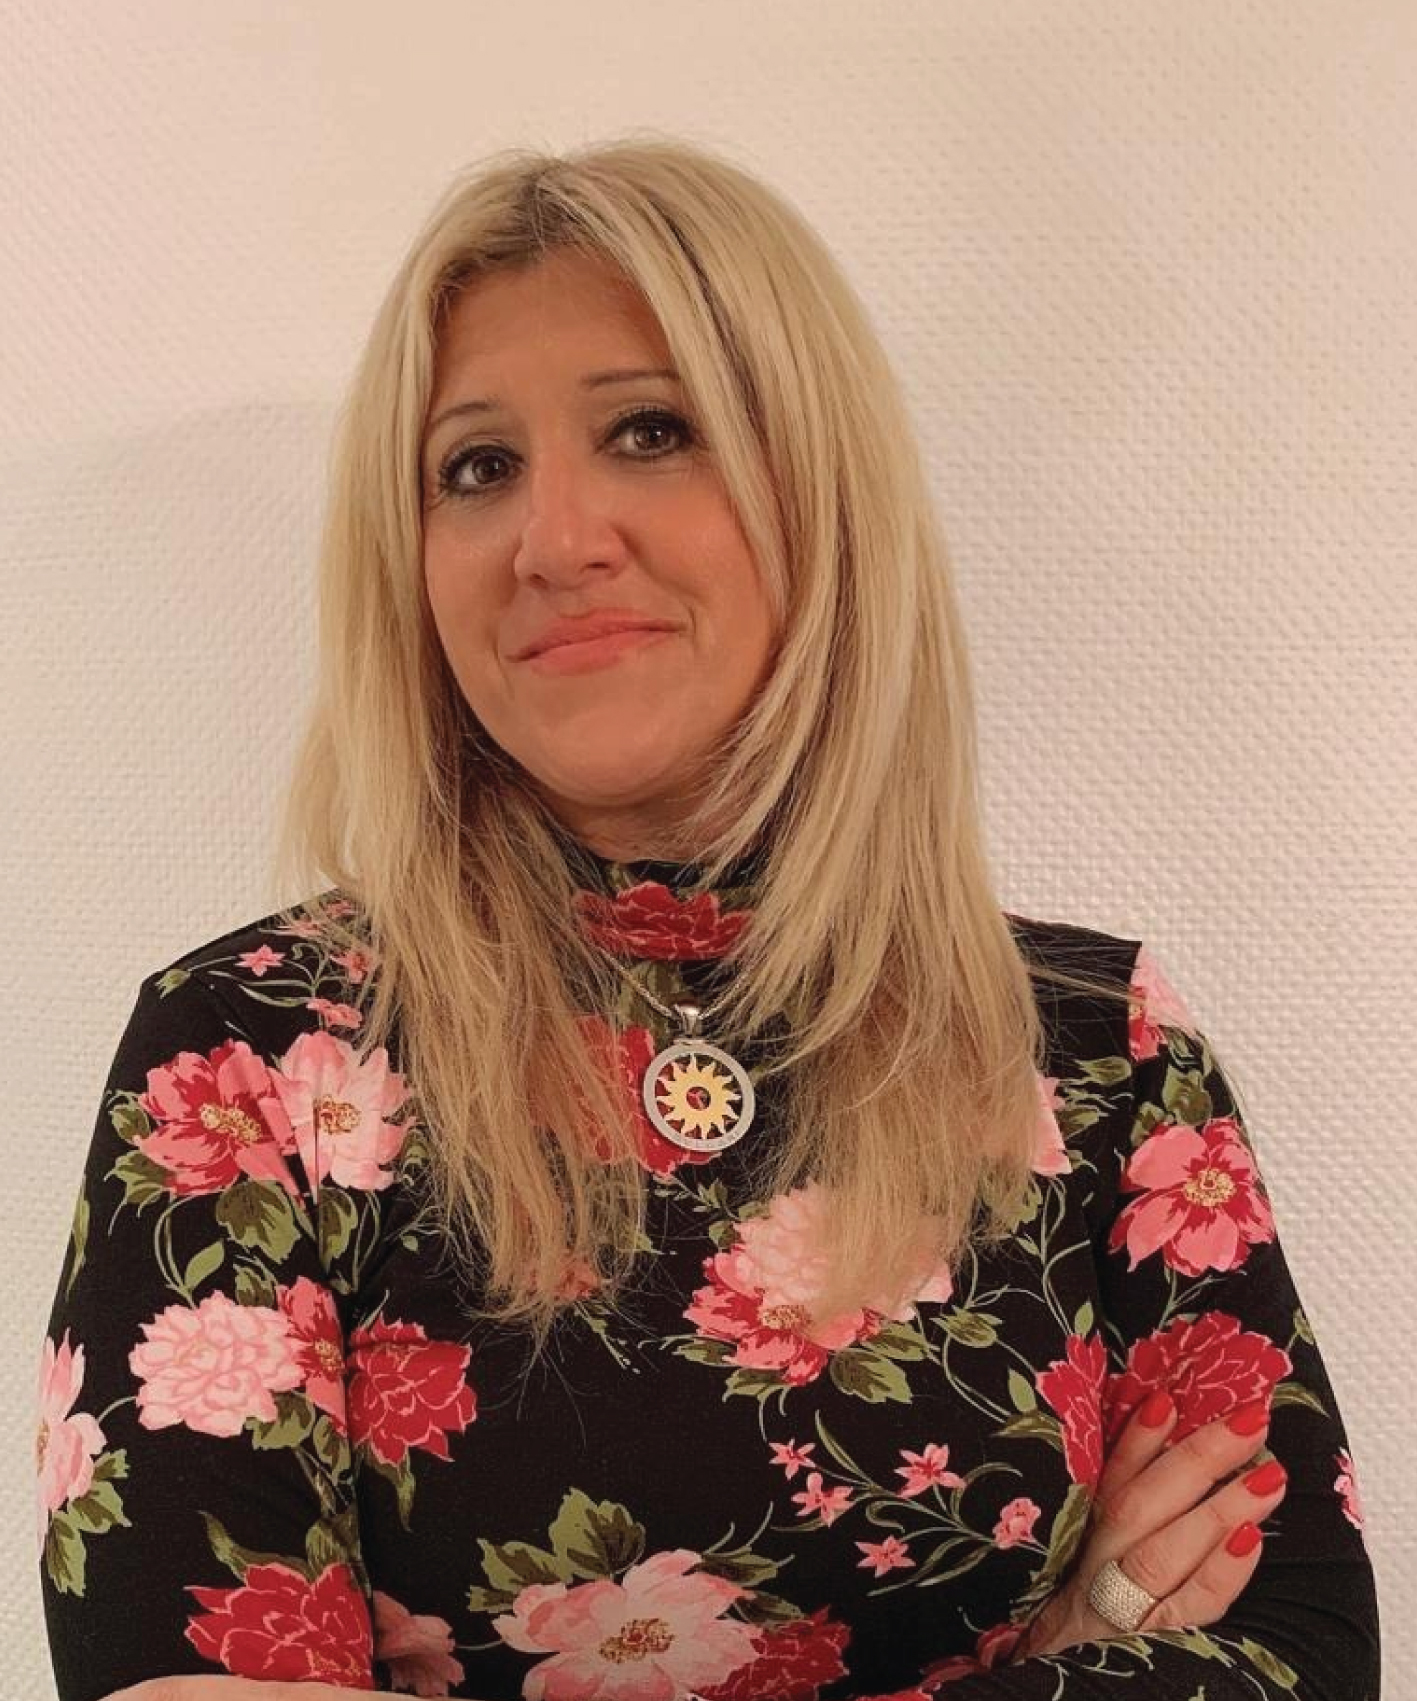 Alessandra Klotz